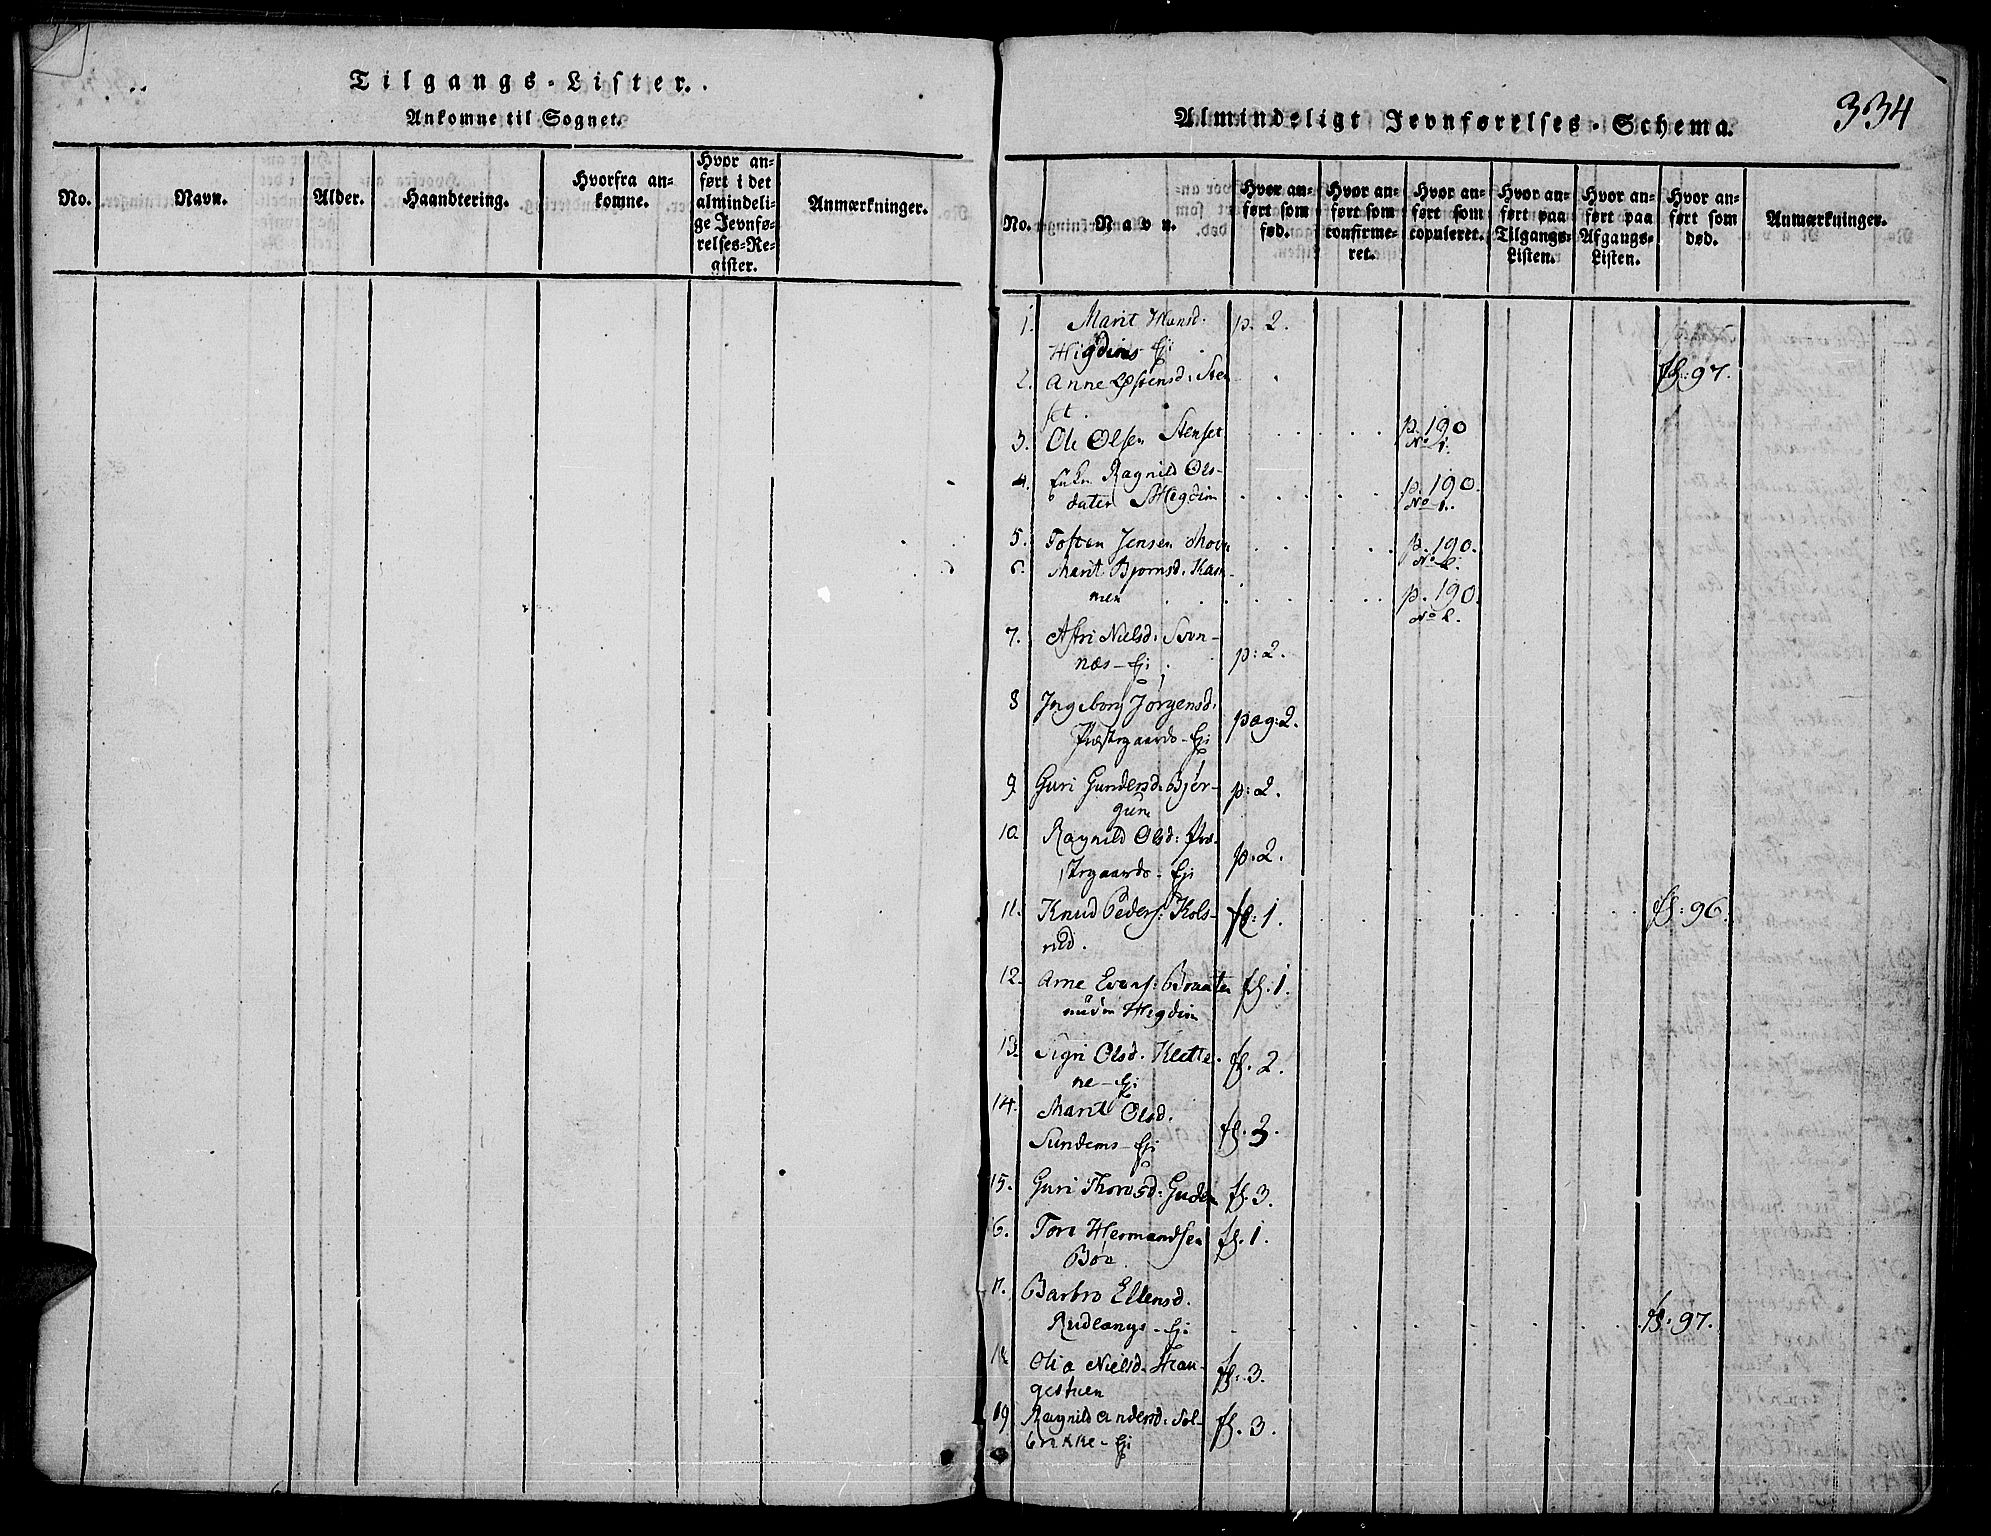 SAH, Nord-Aurdal prestekontor, Ministerialbok nr. 2, 1816-1828, s. 334